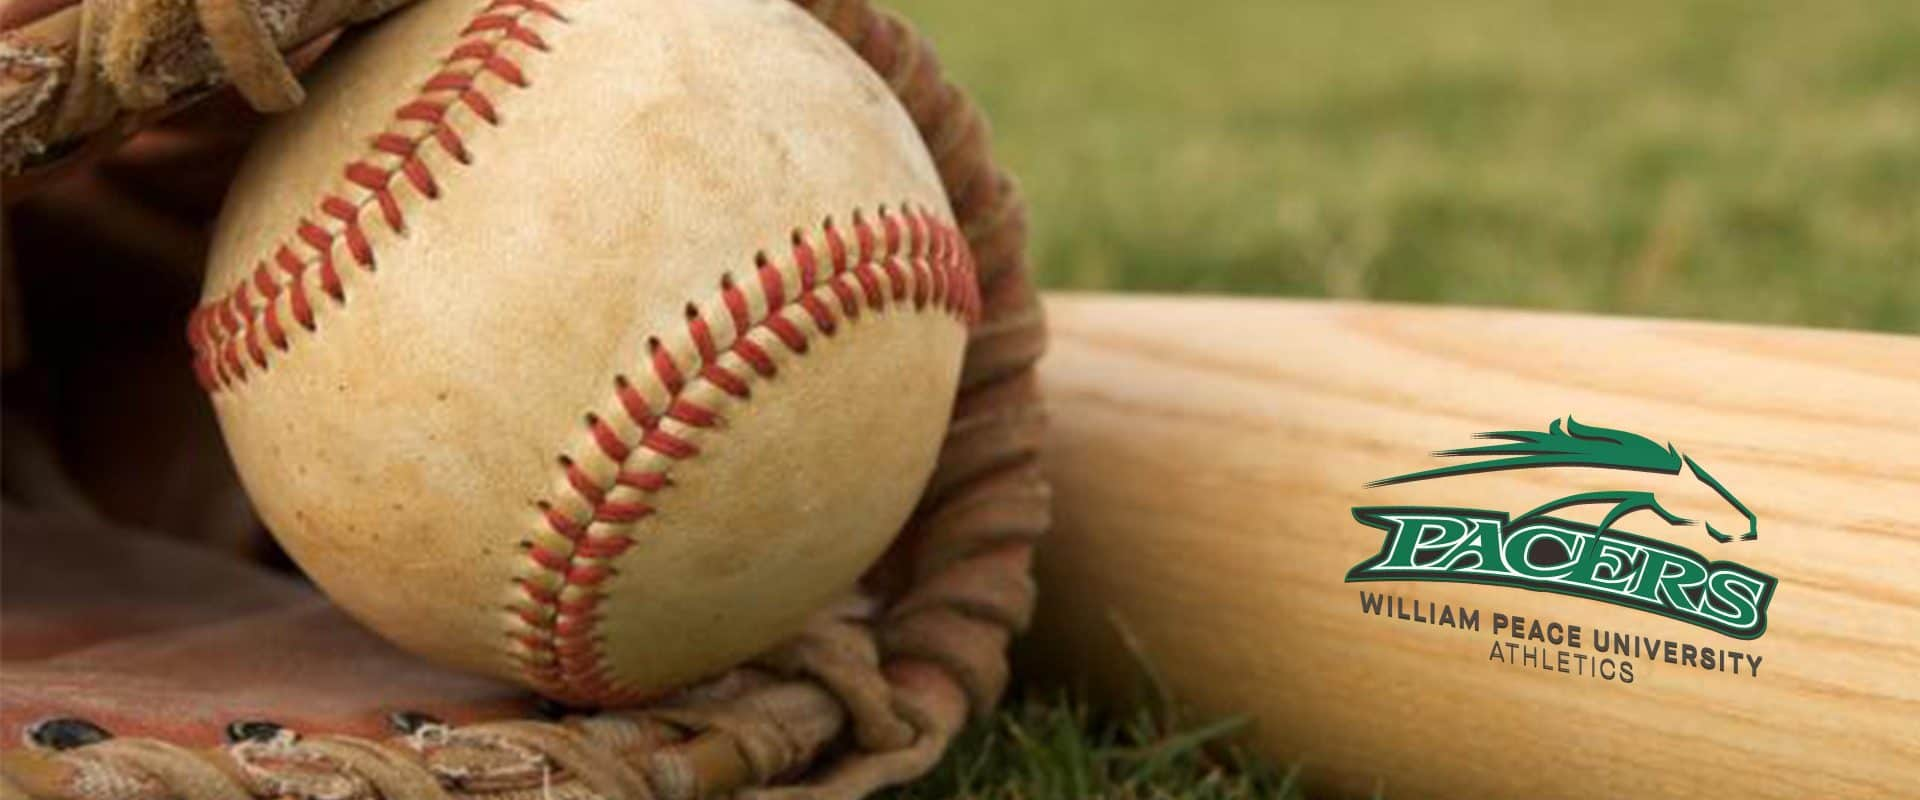 WPU baseball bat and ball.